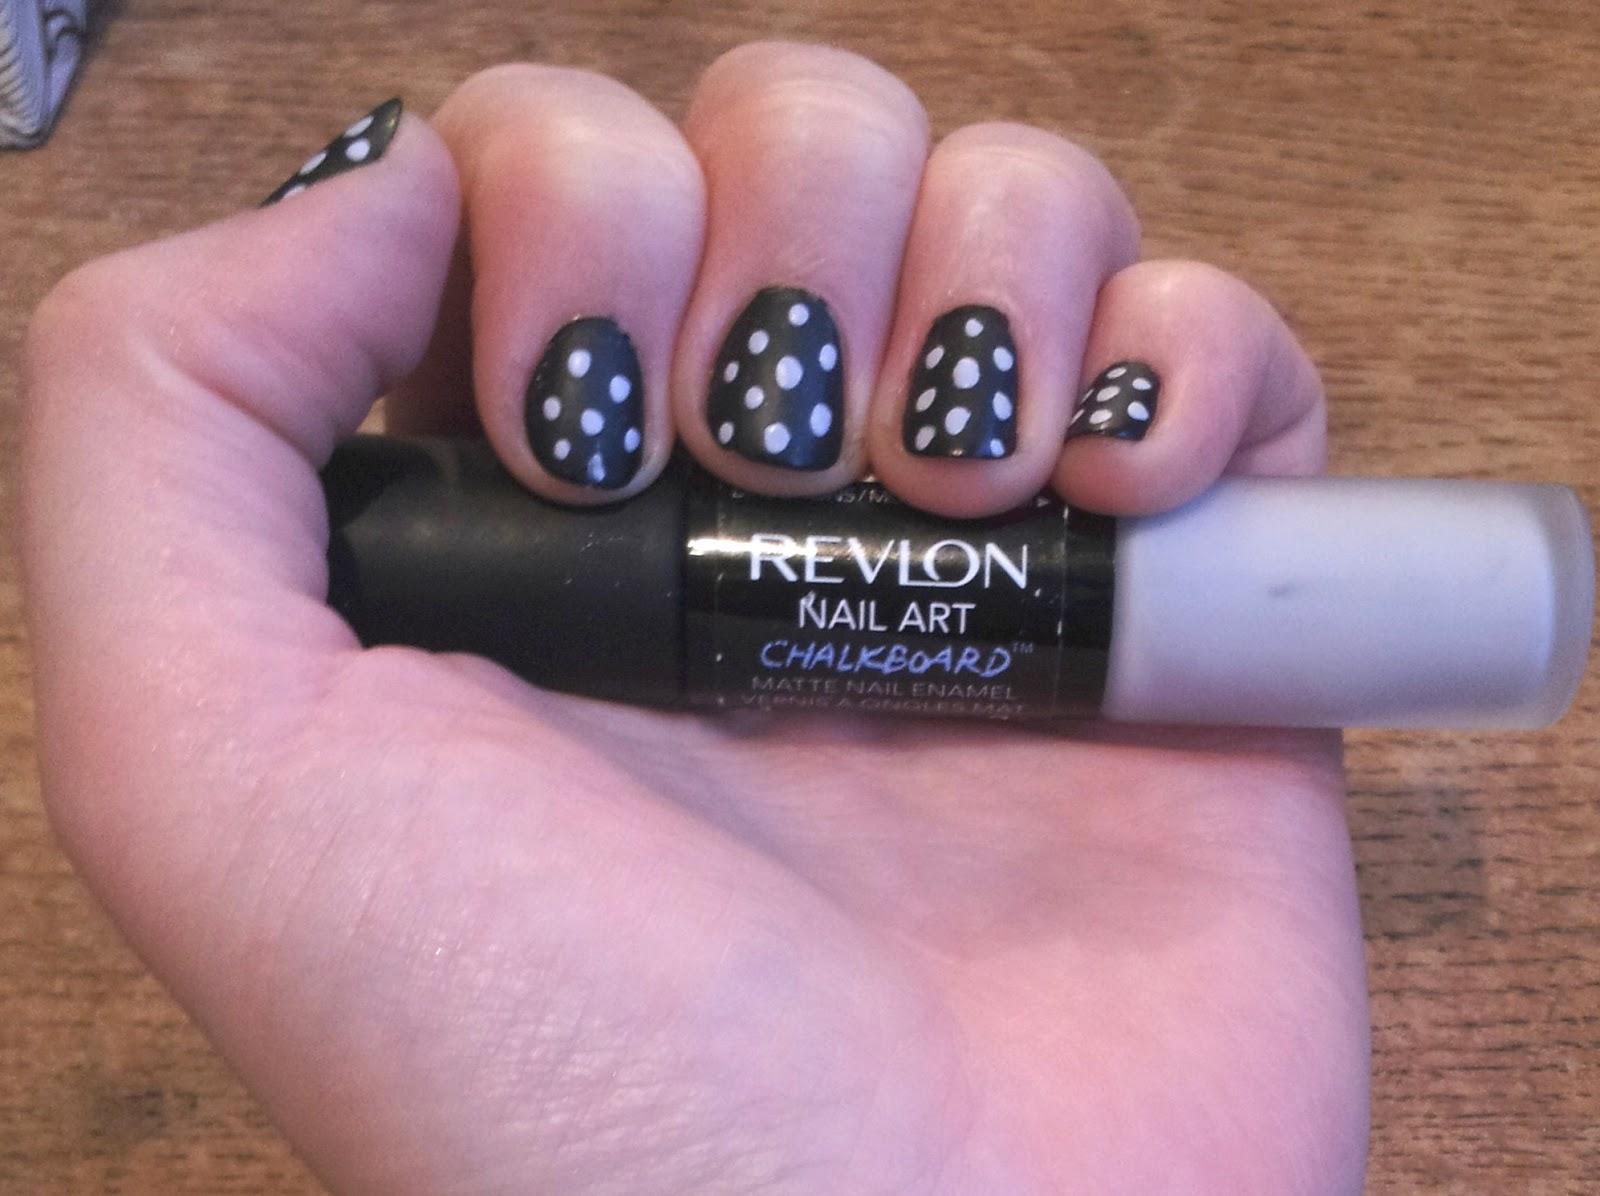 Revlon Nail Art Chalkboard